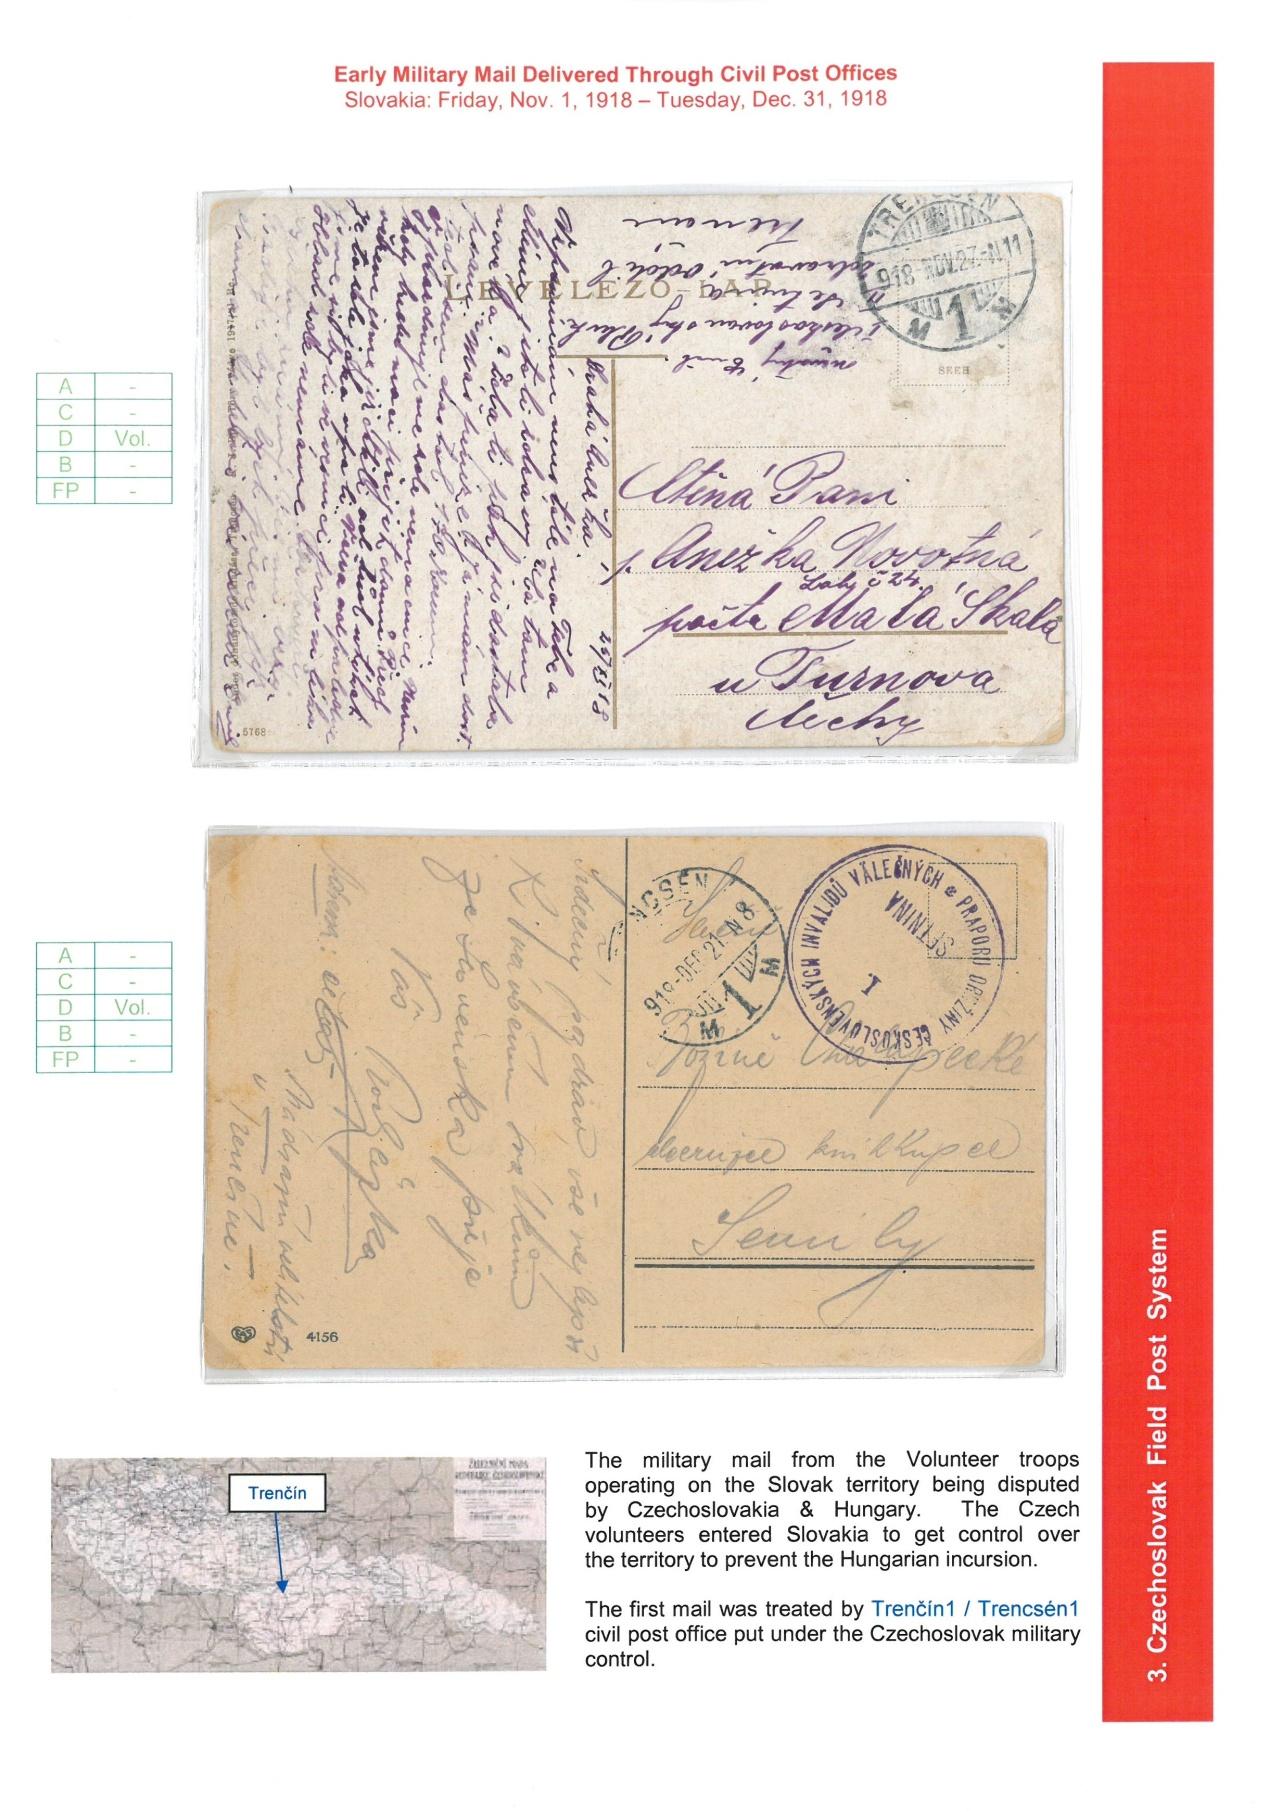 Philatelic exhibit: FIELD POST SYSTEMS ON CZECHOSLOVAK